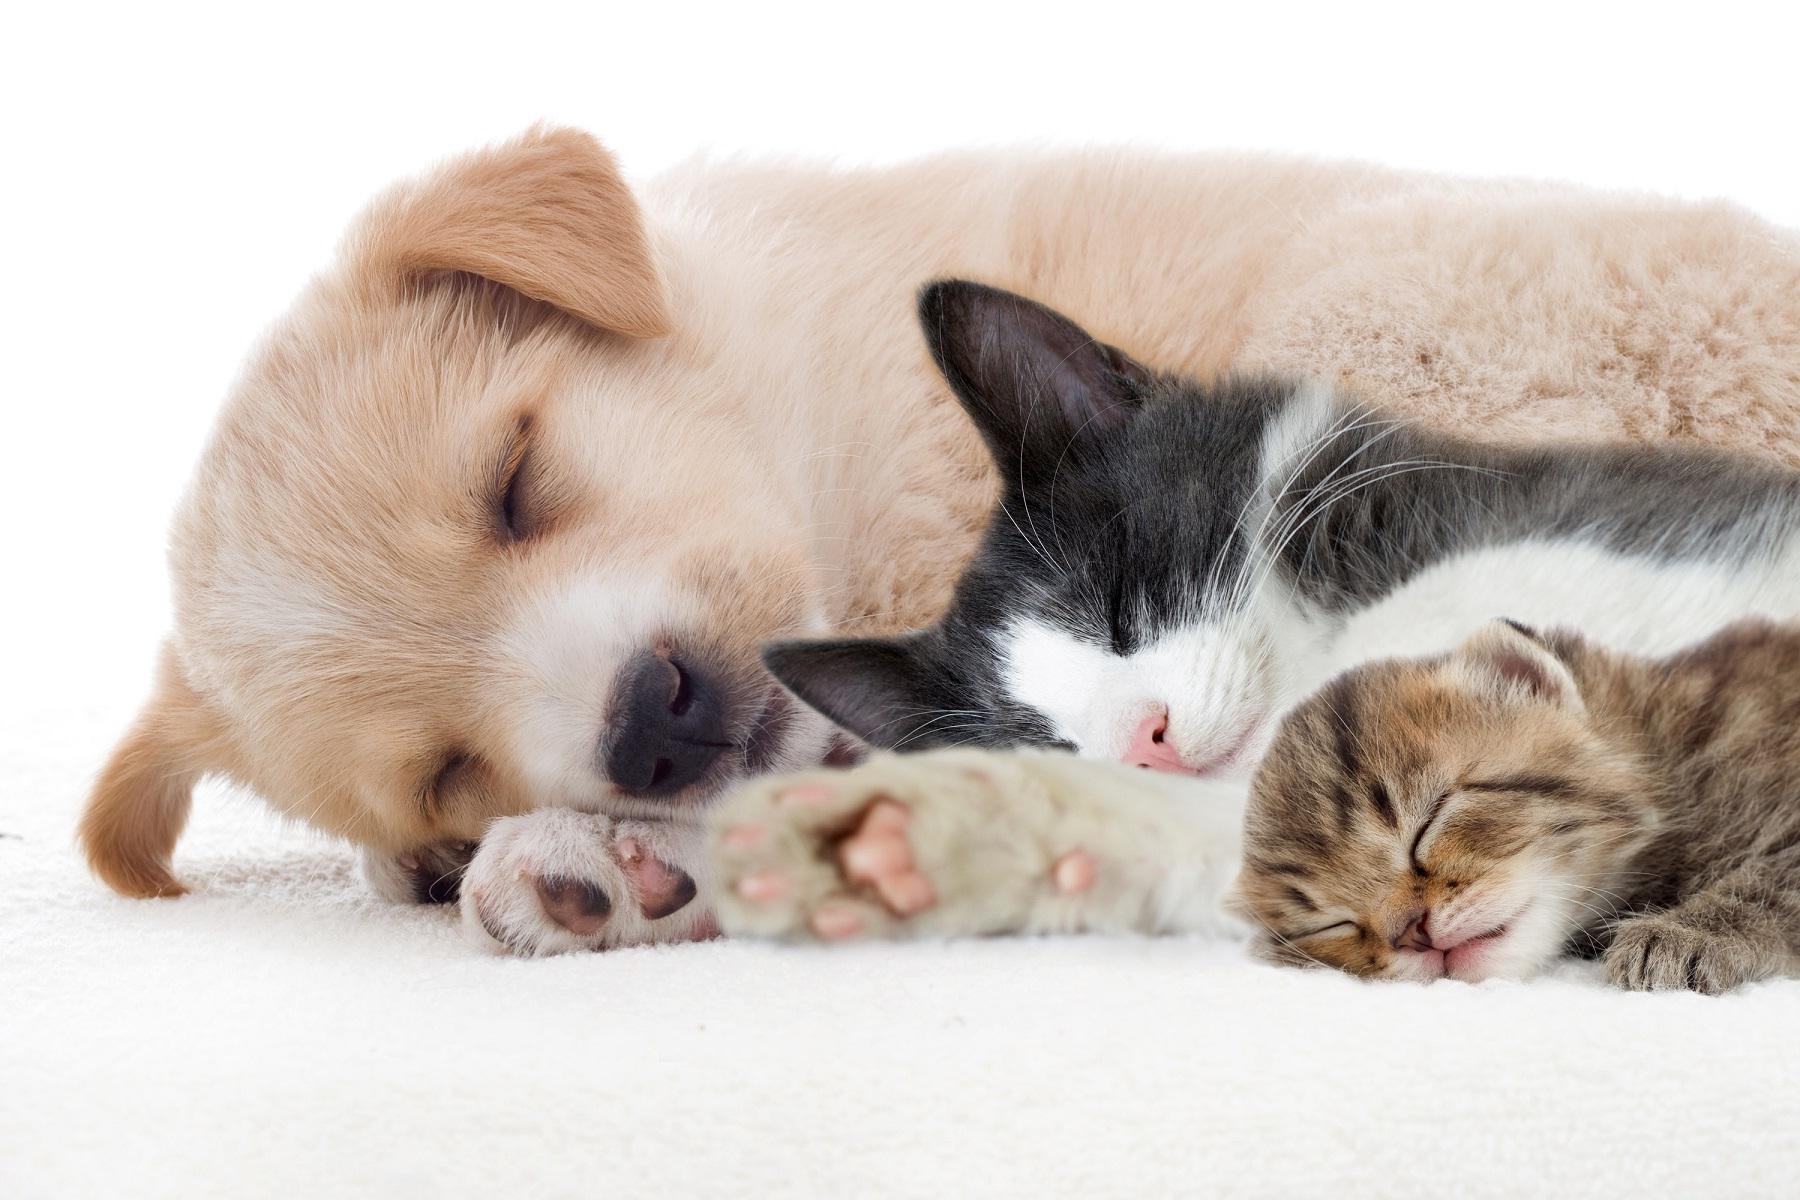 Dog-cat-friendship-sleep-together.jpg